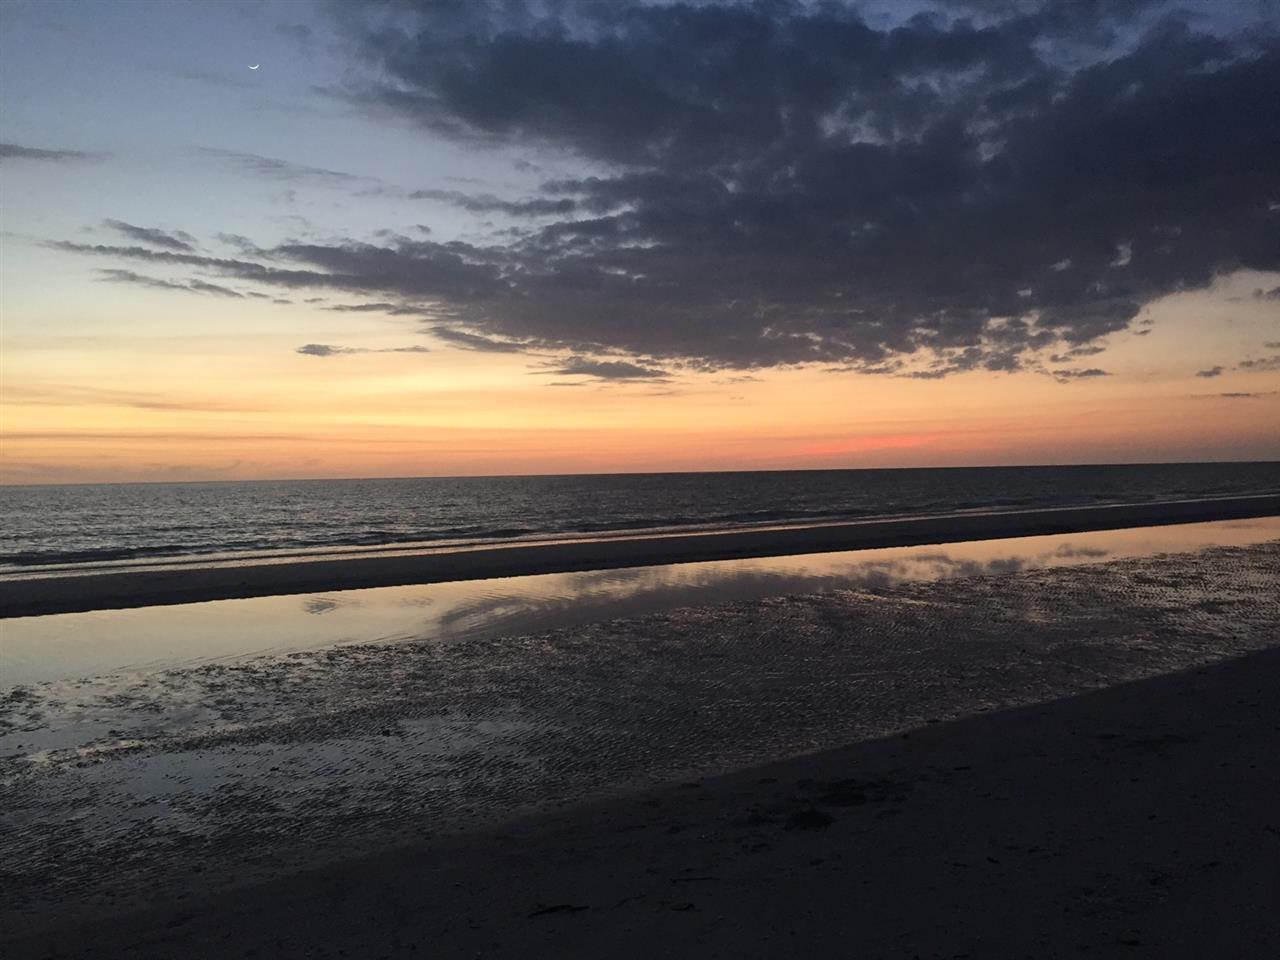 #LeadingRElocal #MarcoIsland #Florida #sunset #beach